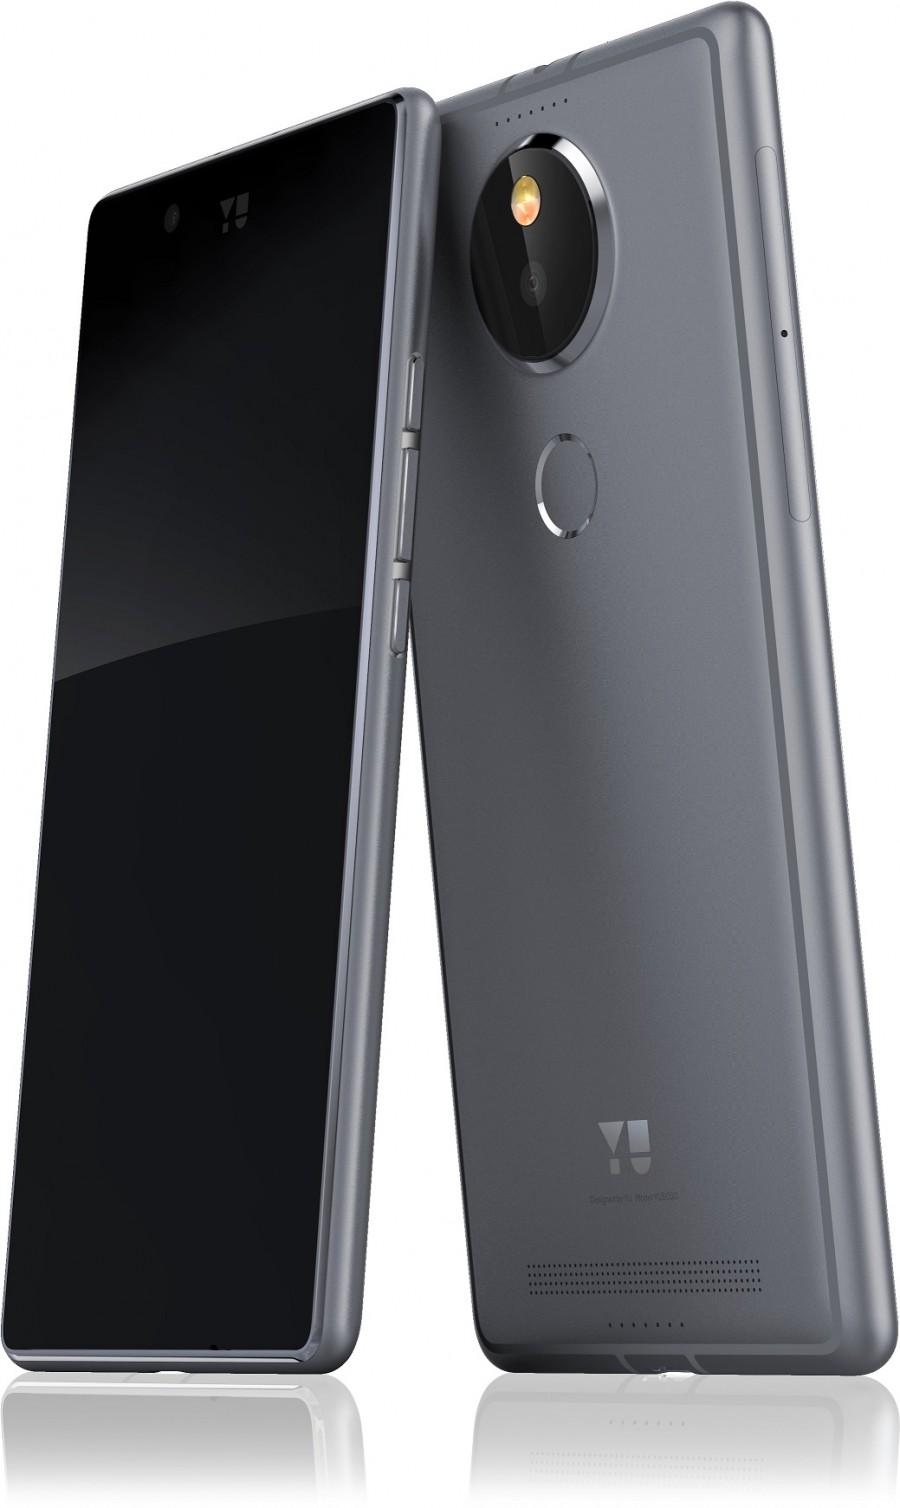 Yutopia,Yutopia launch,Yutopia smartphone,Micromax Yutopia,Micromax smartphone,smartphone,Micromax,Micromax movile,Micromax's YU